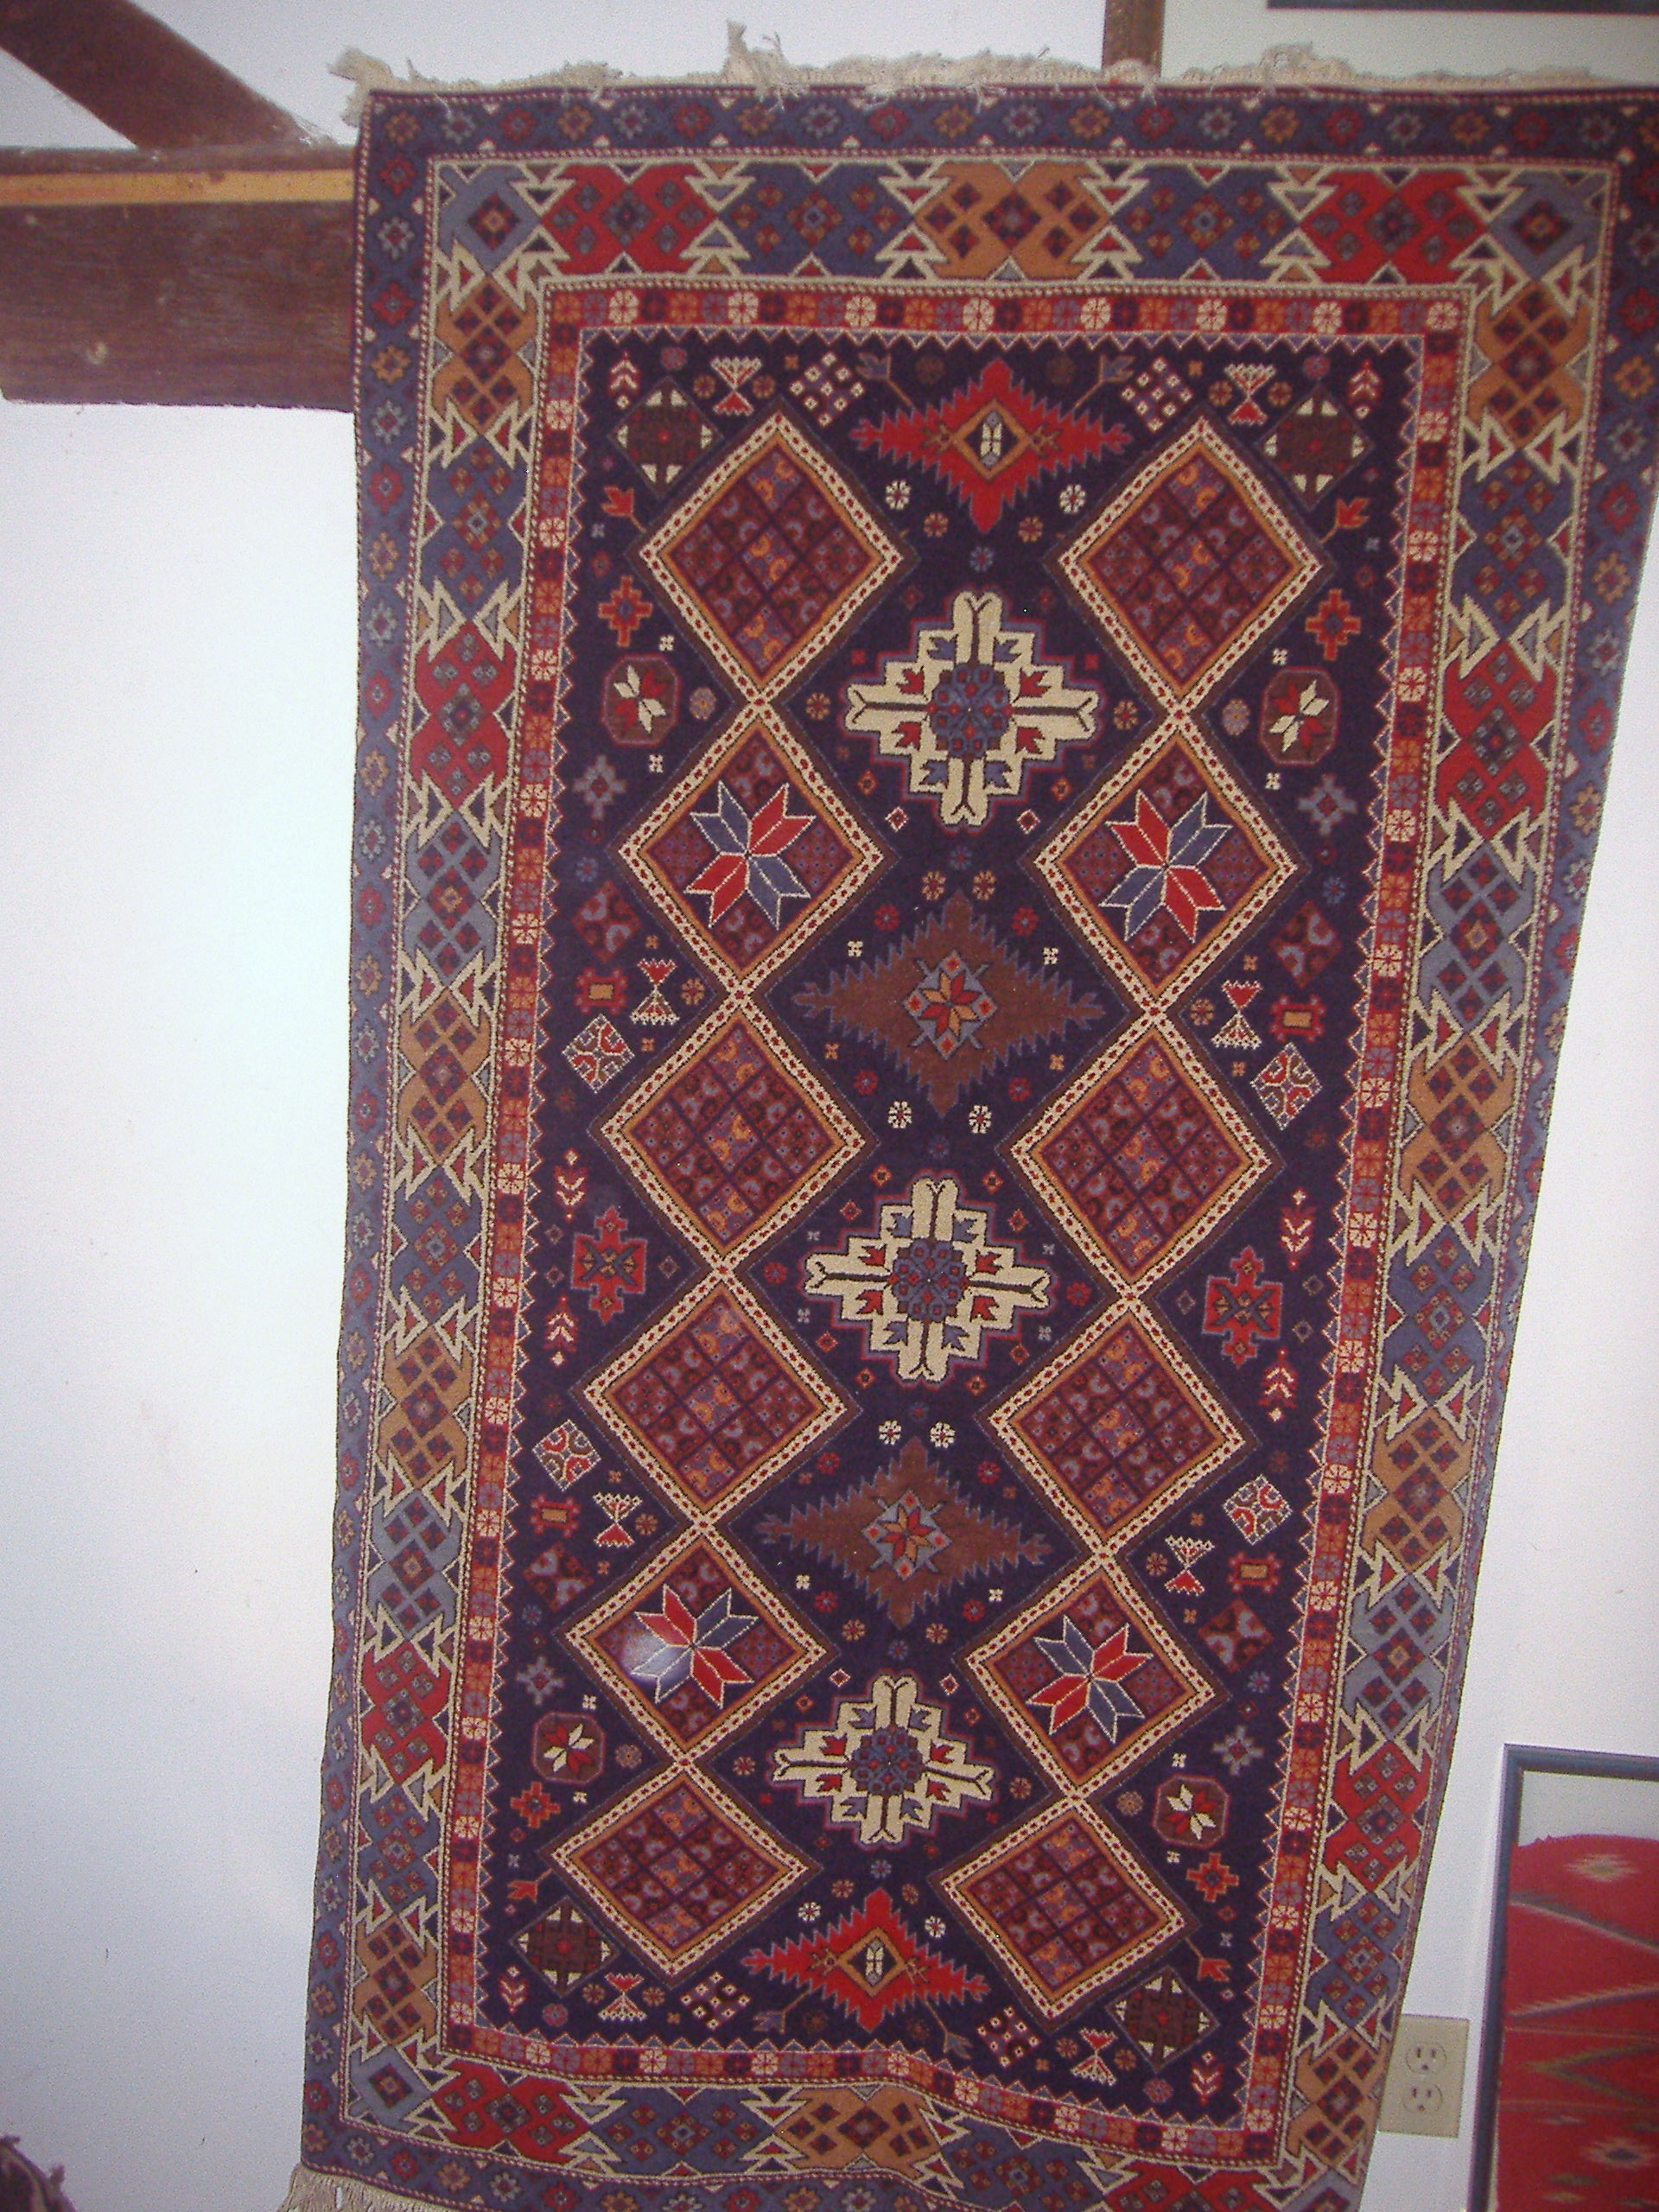 Vermont Oriental Rugs Sales Cleaning Repair Appraisals